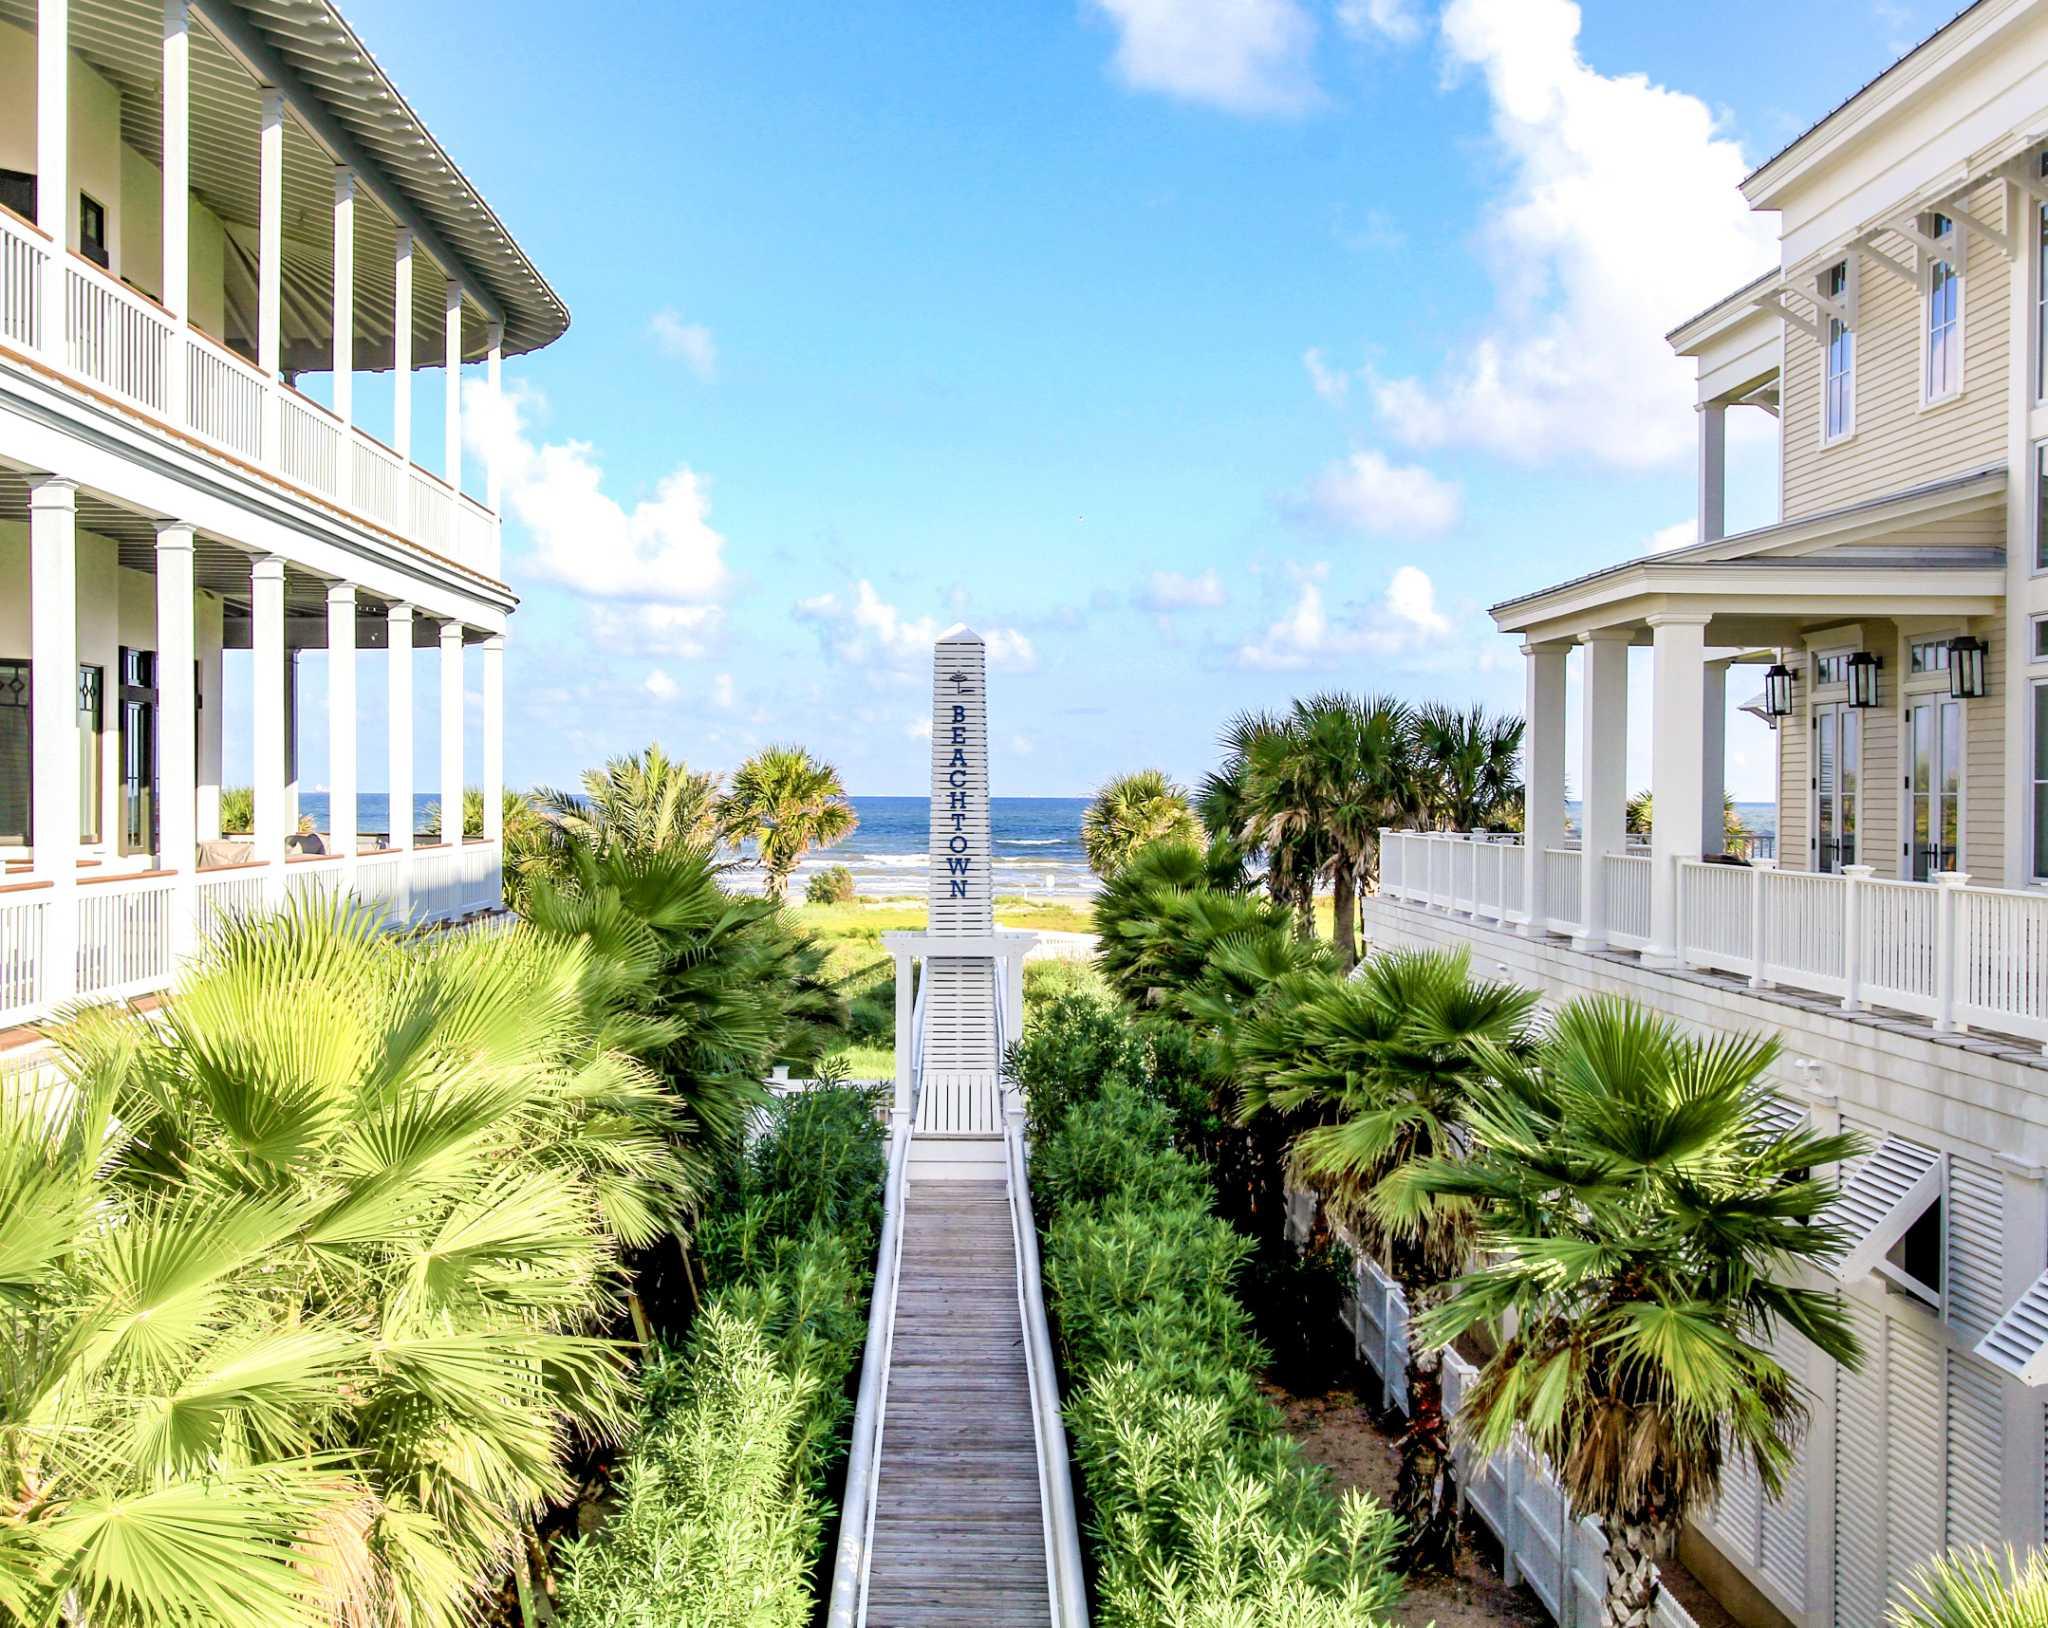 Beachtown offers walkable, timeless community in Galveston